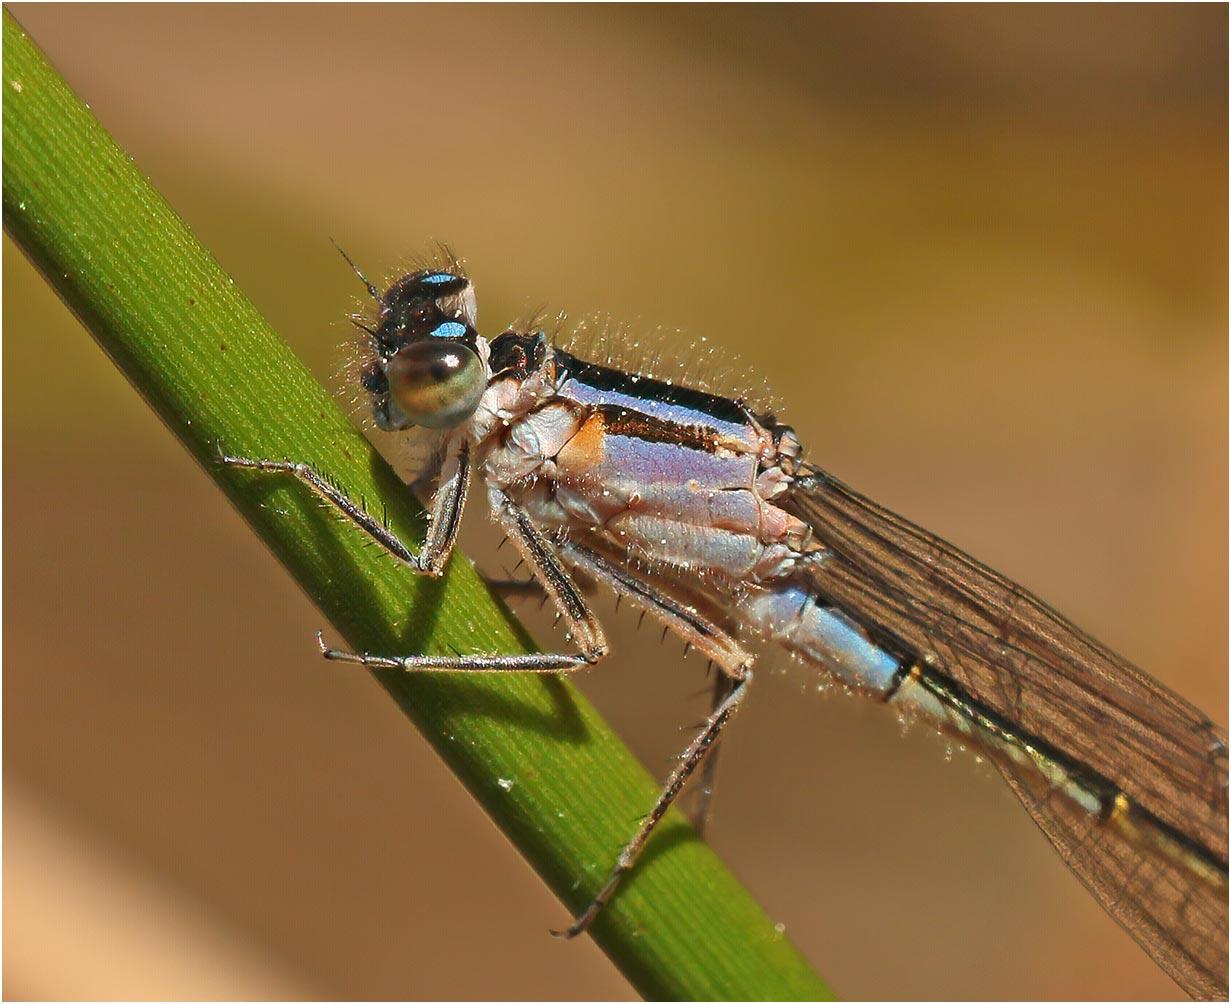 Ischnura elegans femelle immature type violacea Andrezé (France-49), 22/04/2021